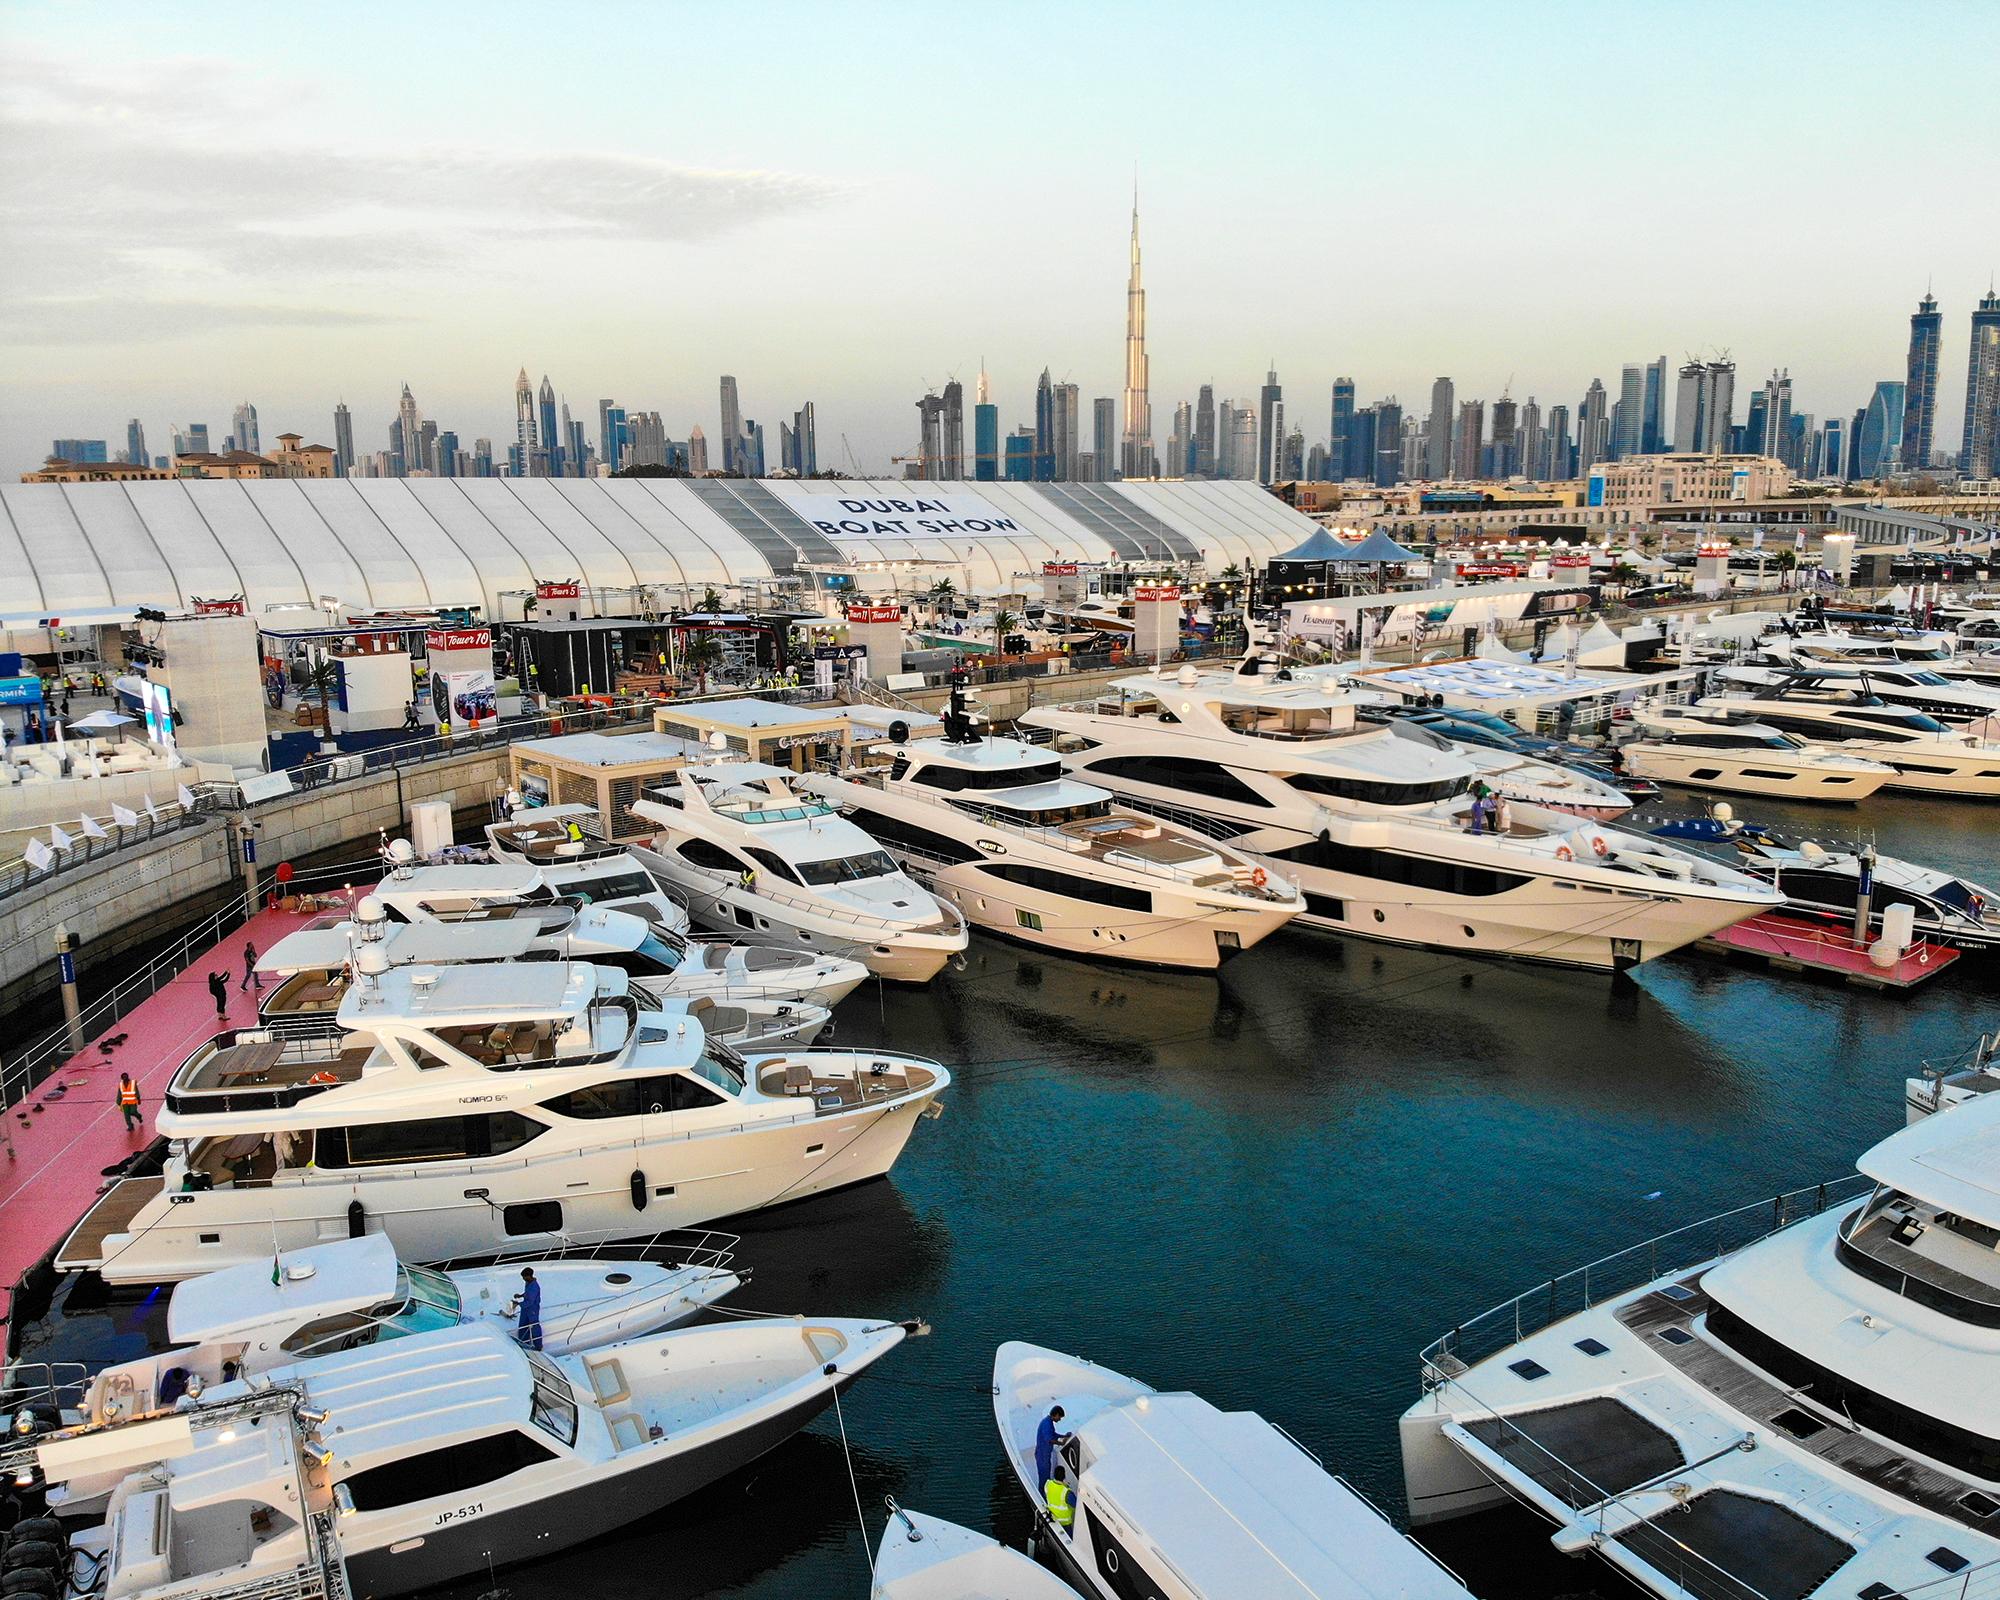 Gulf Craft at the Dubai Boat Show